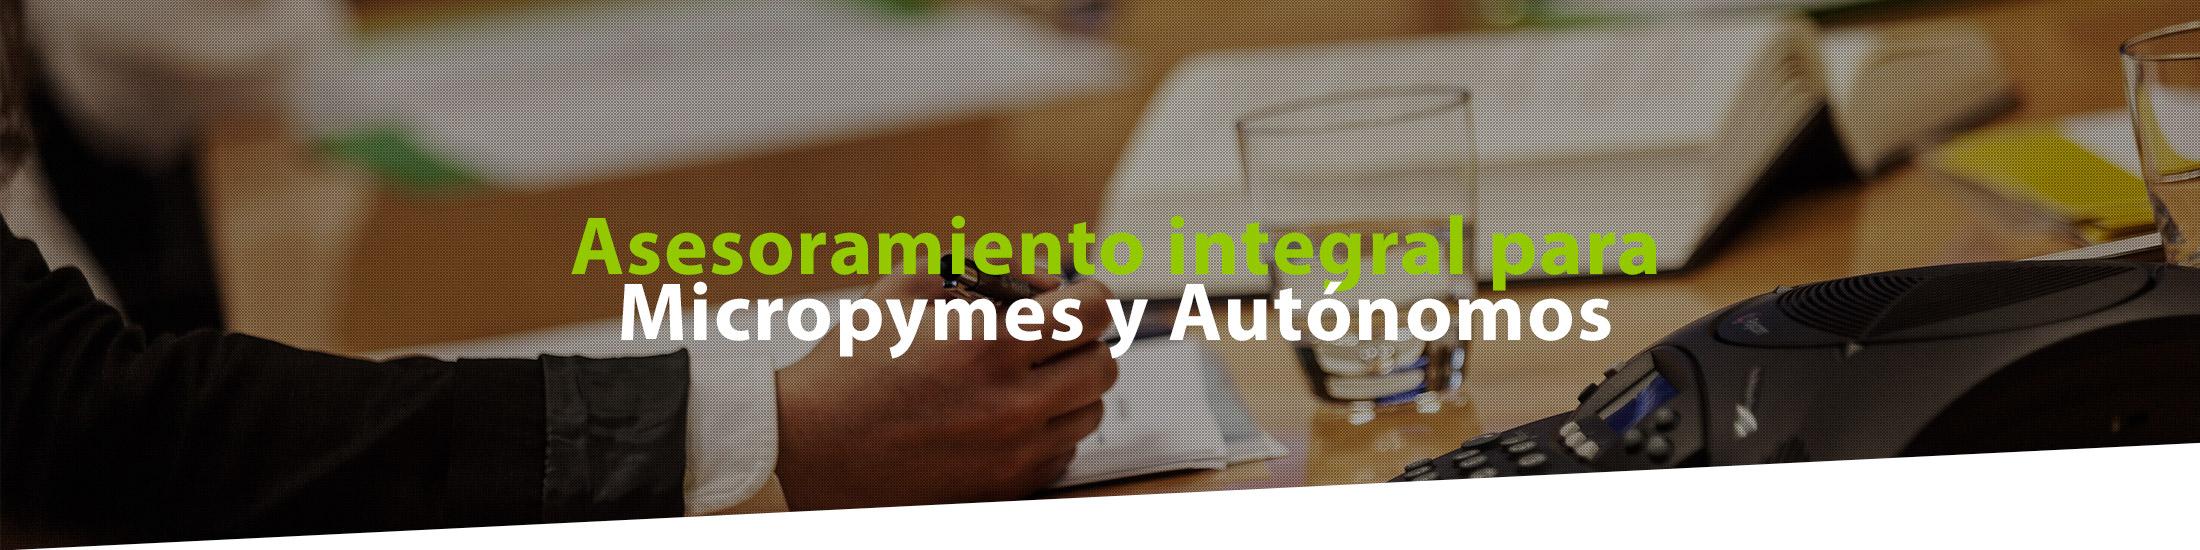 slide1_accounting